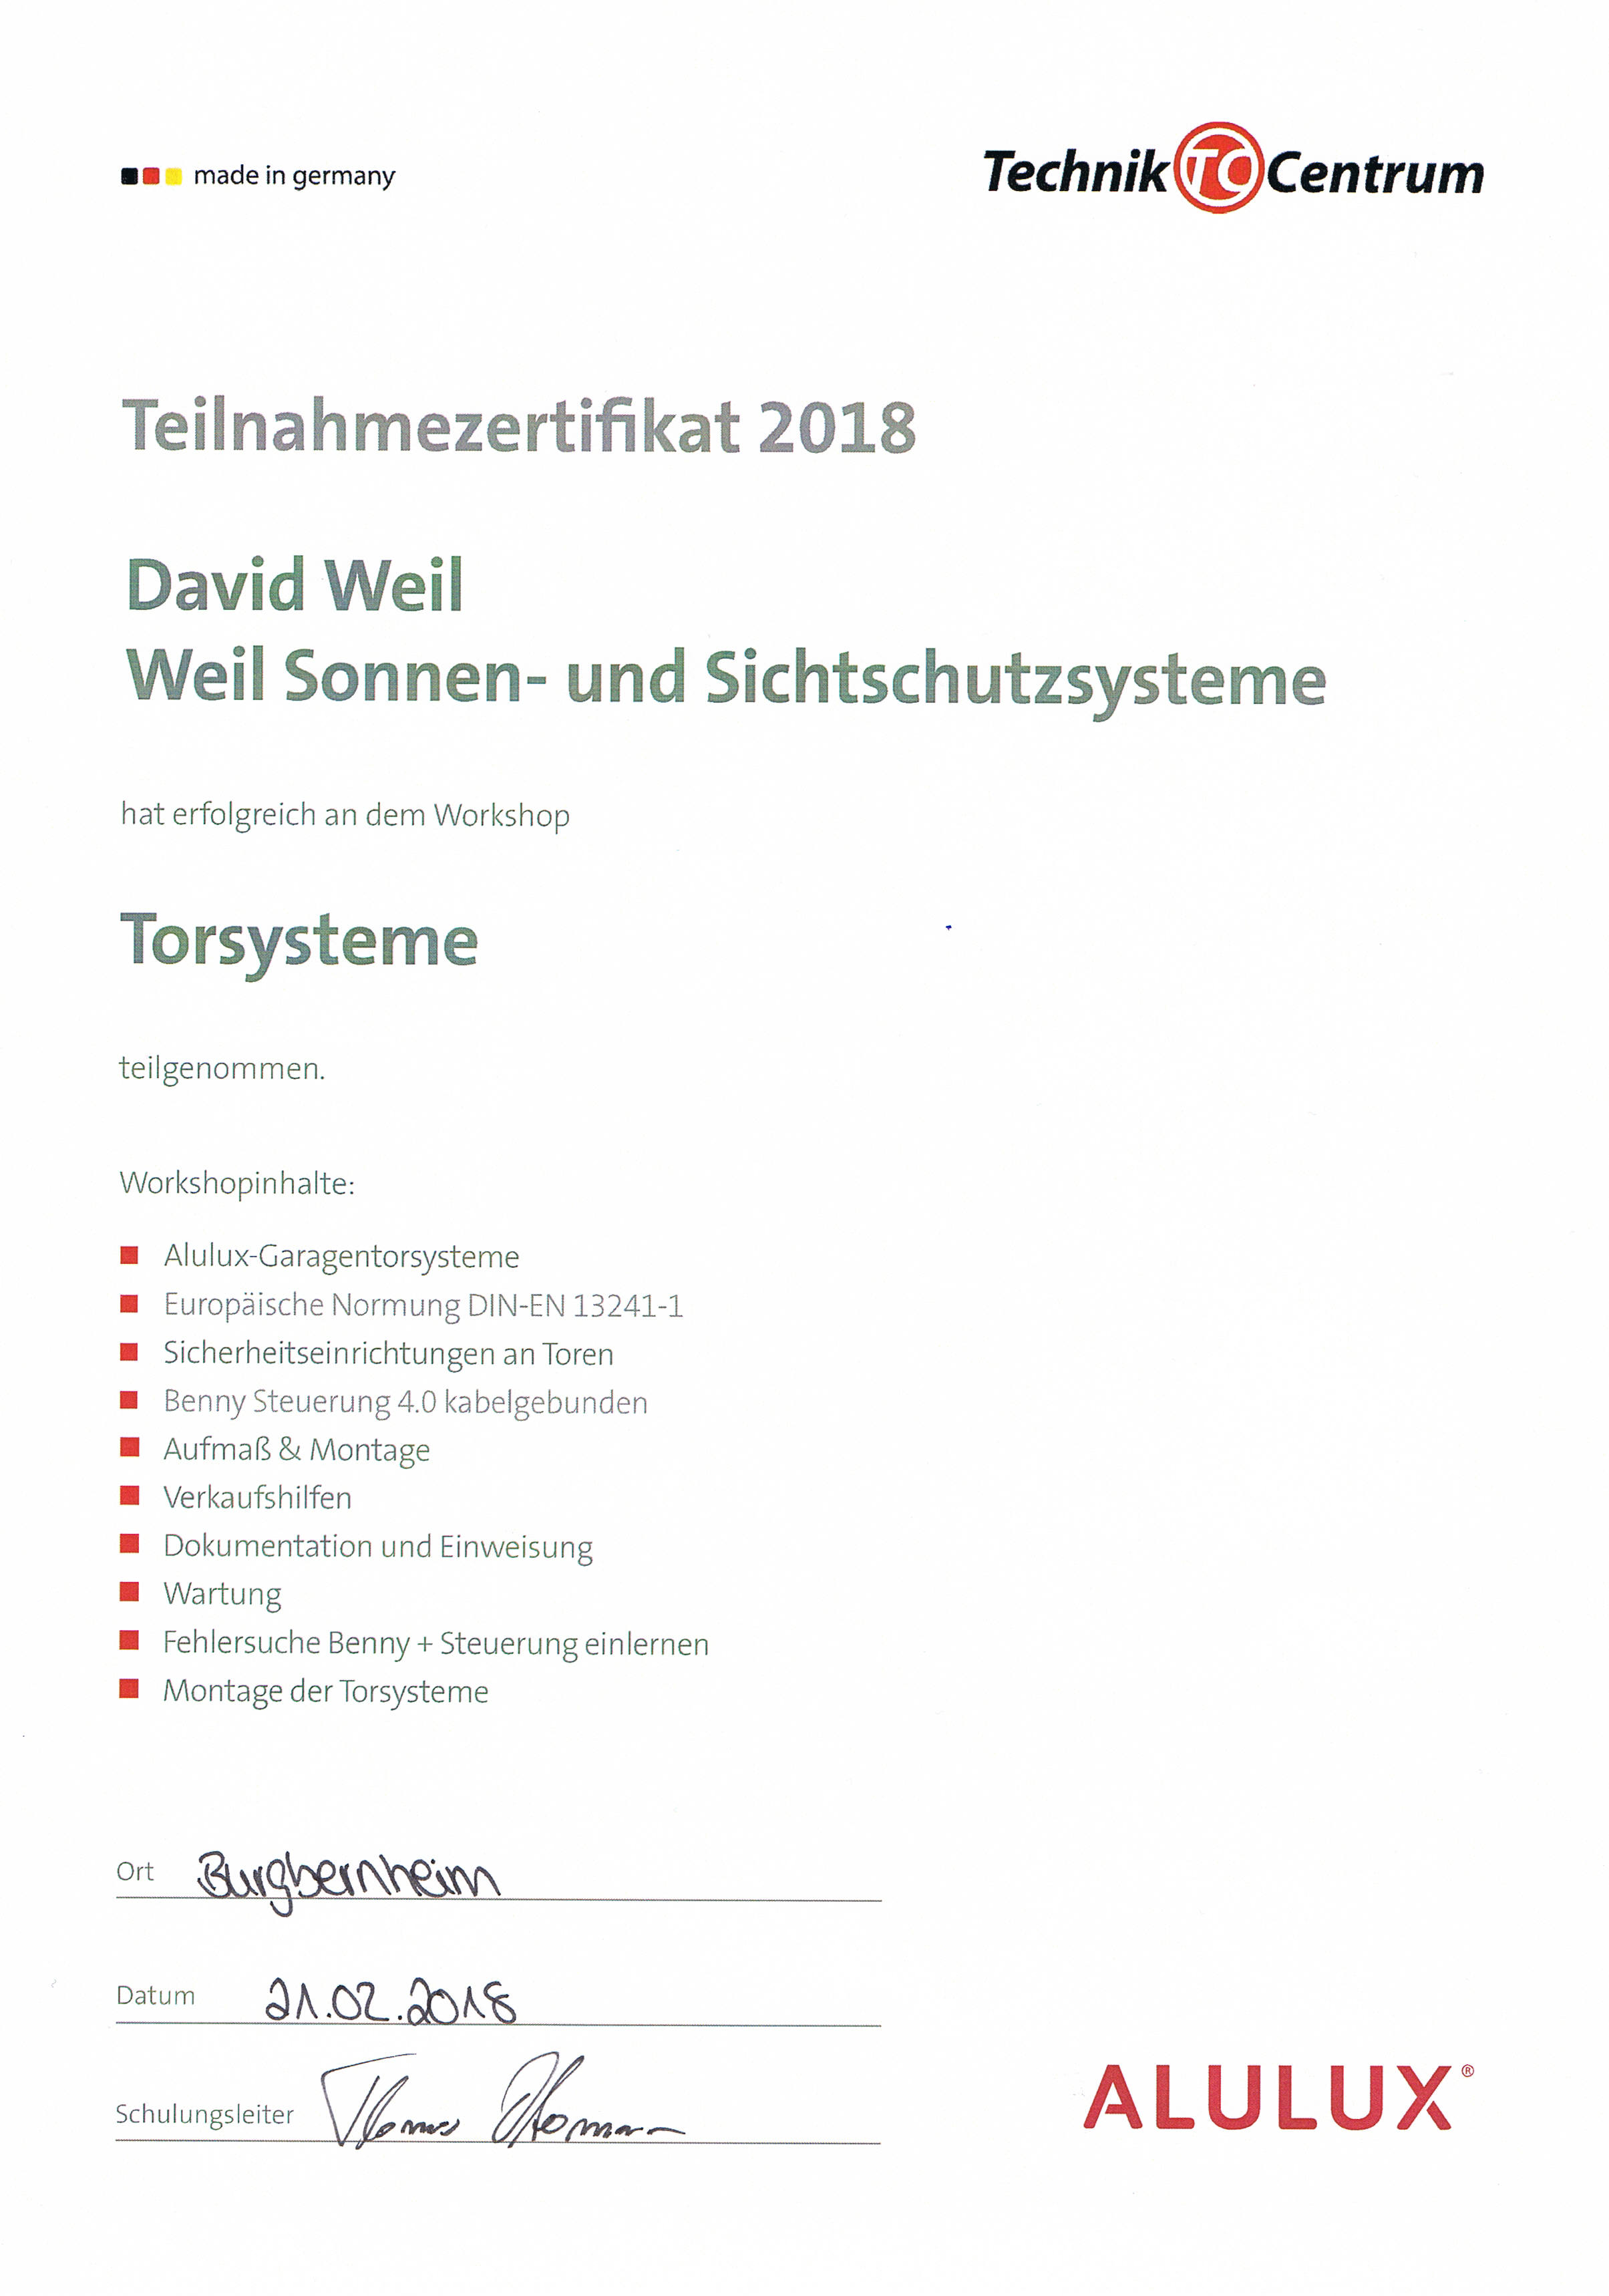 Torsysteme 18